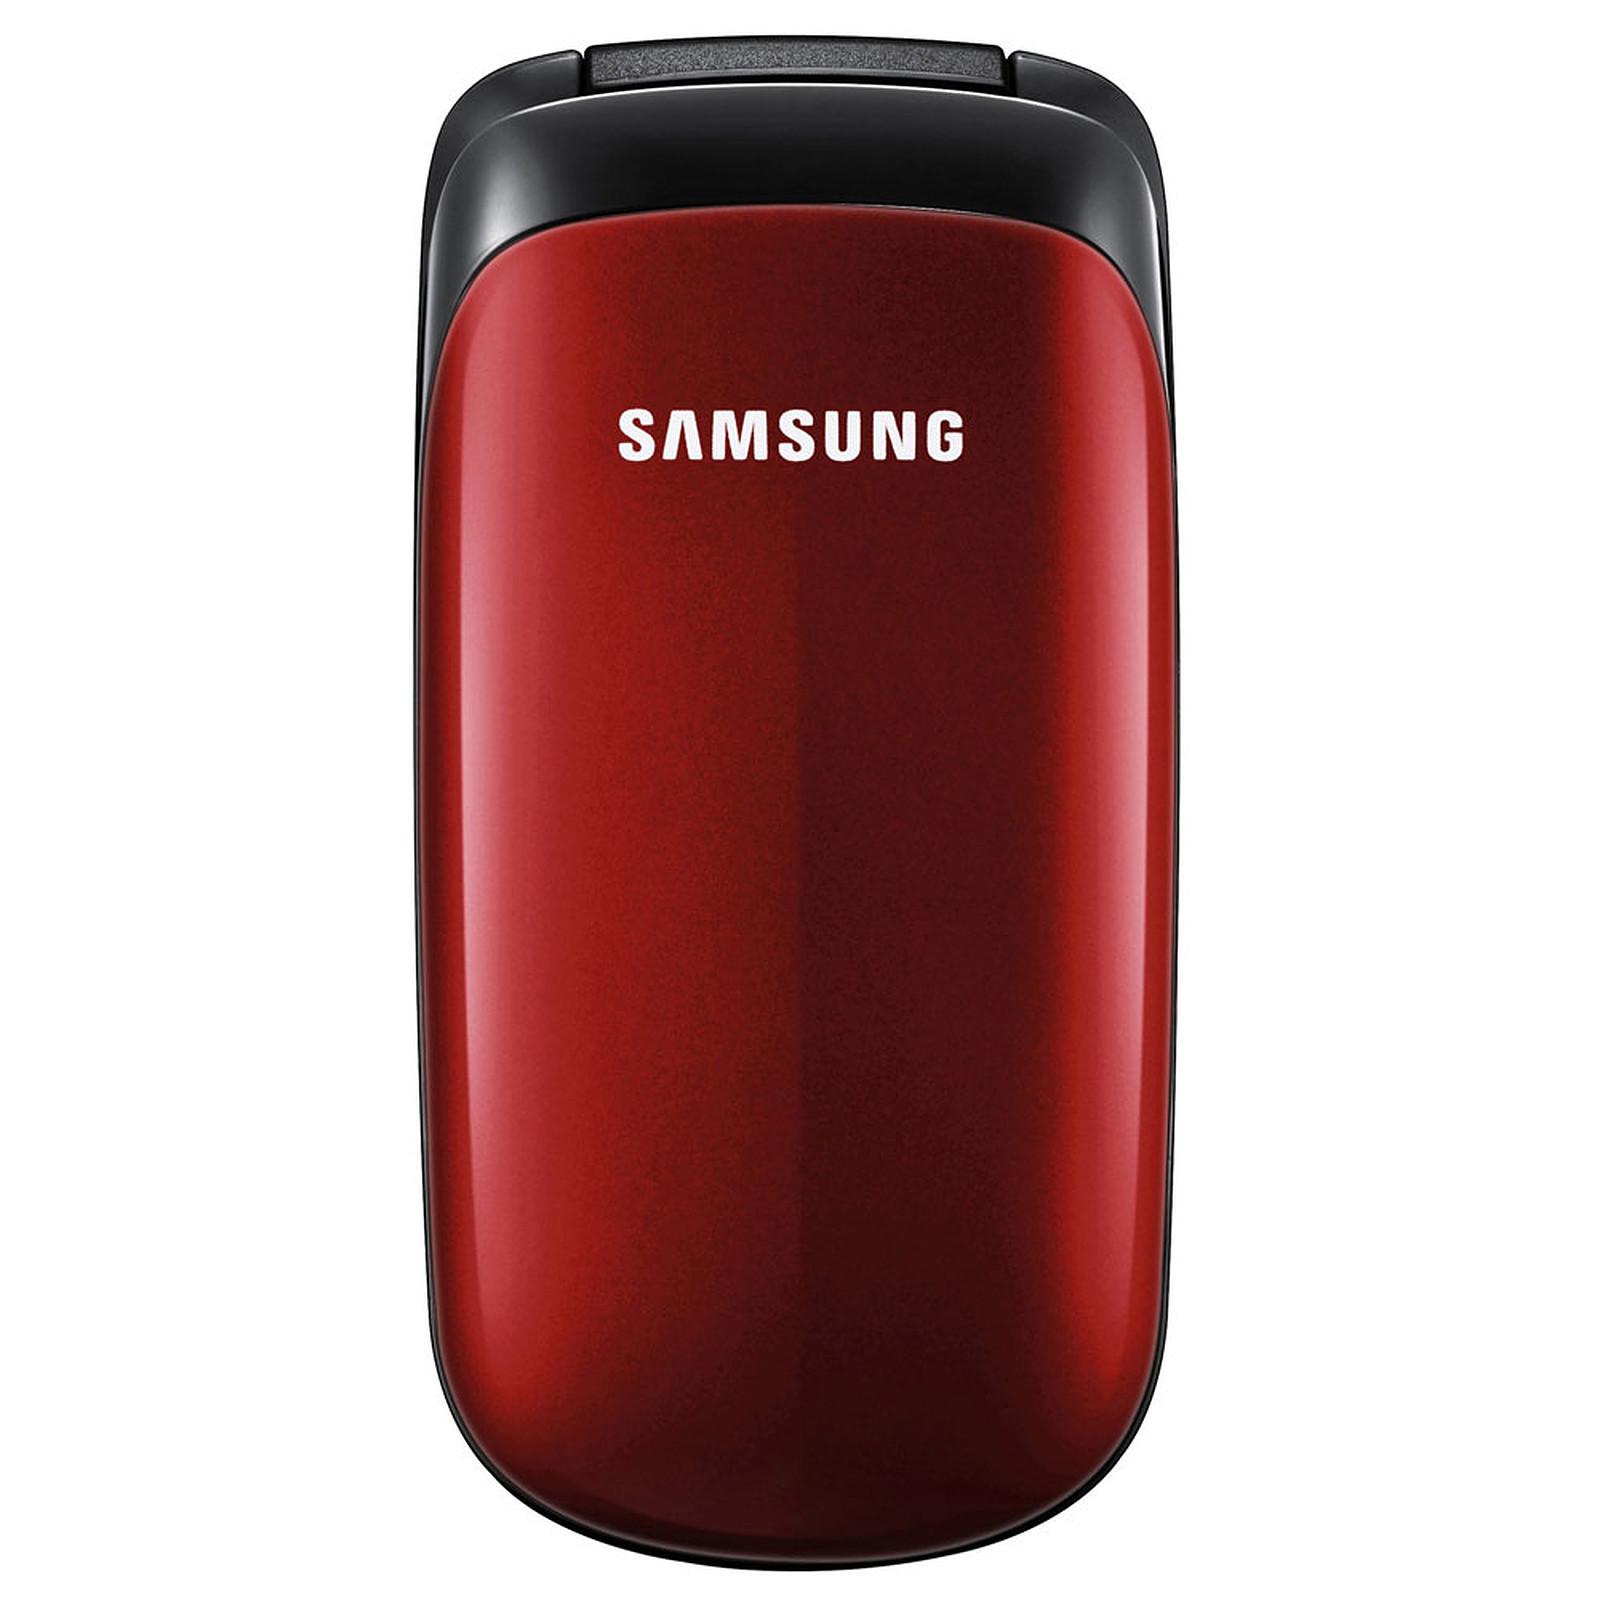 Samsung E1150 Ruby Red